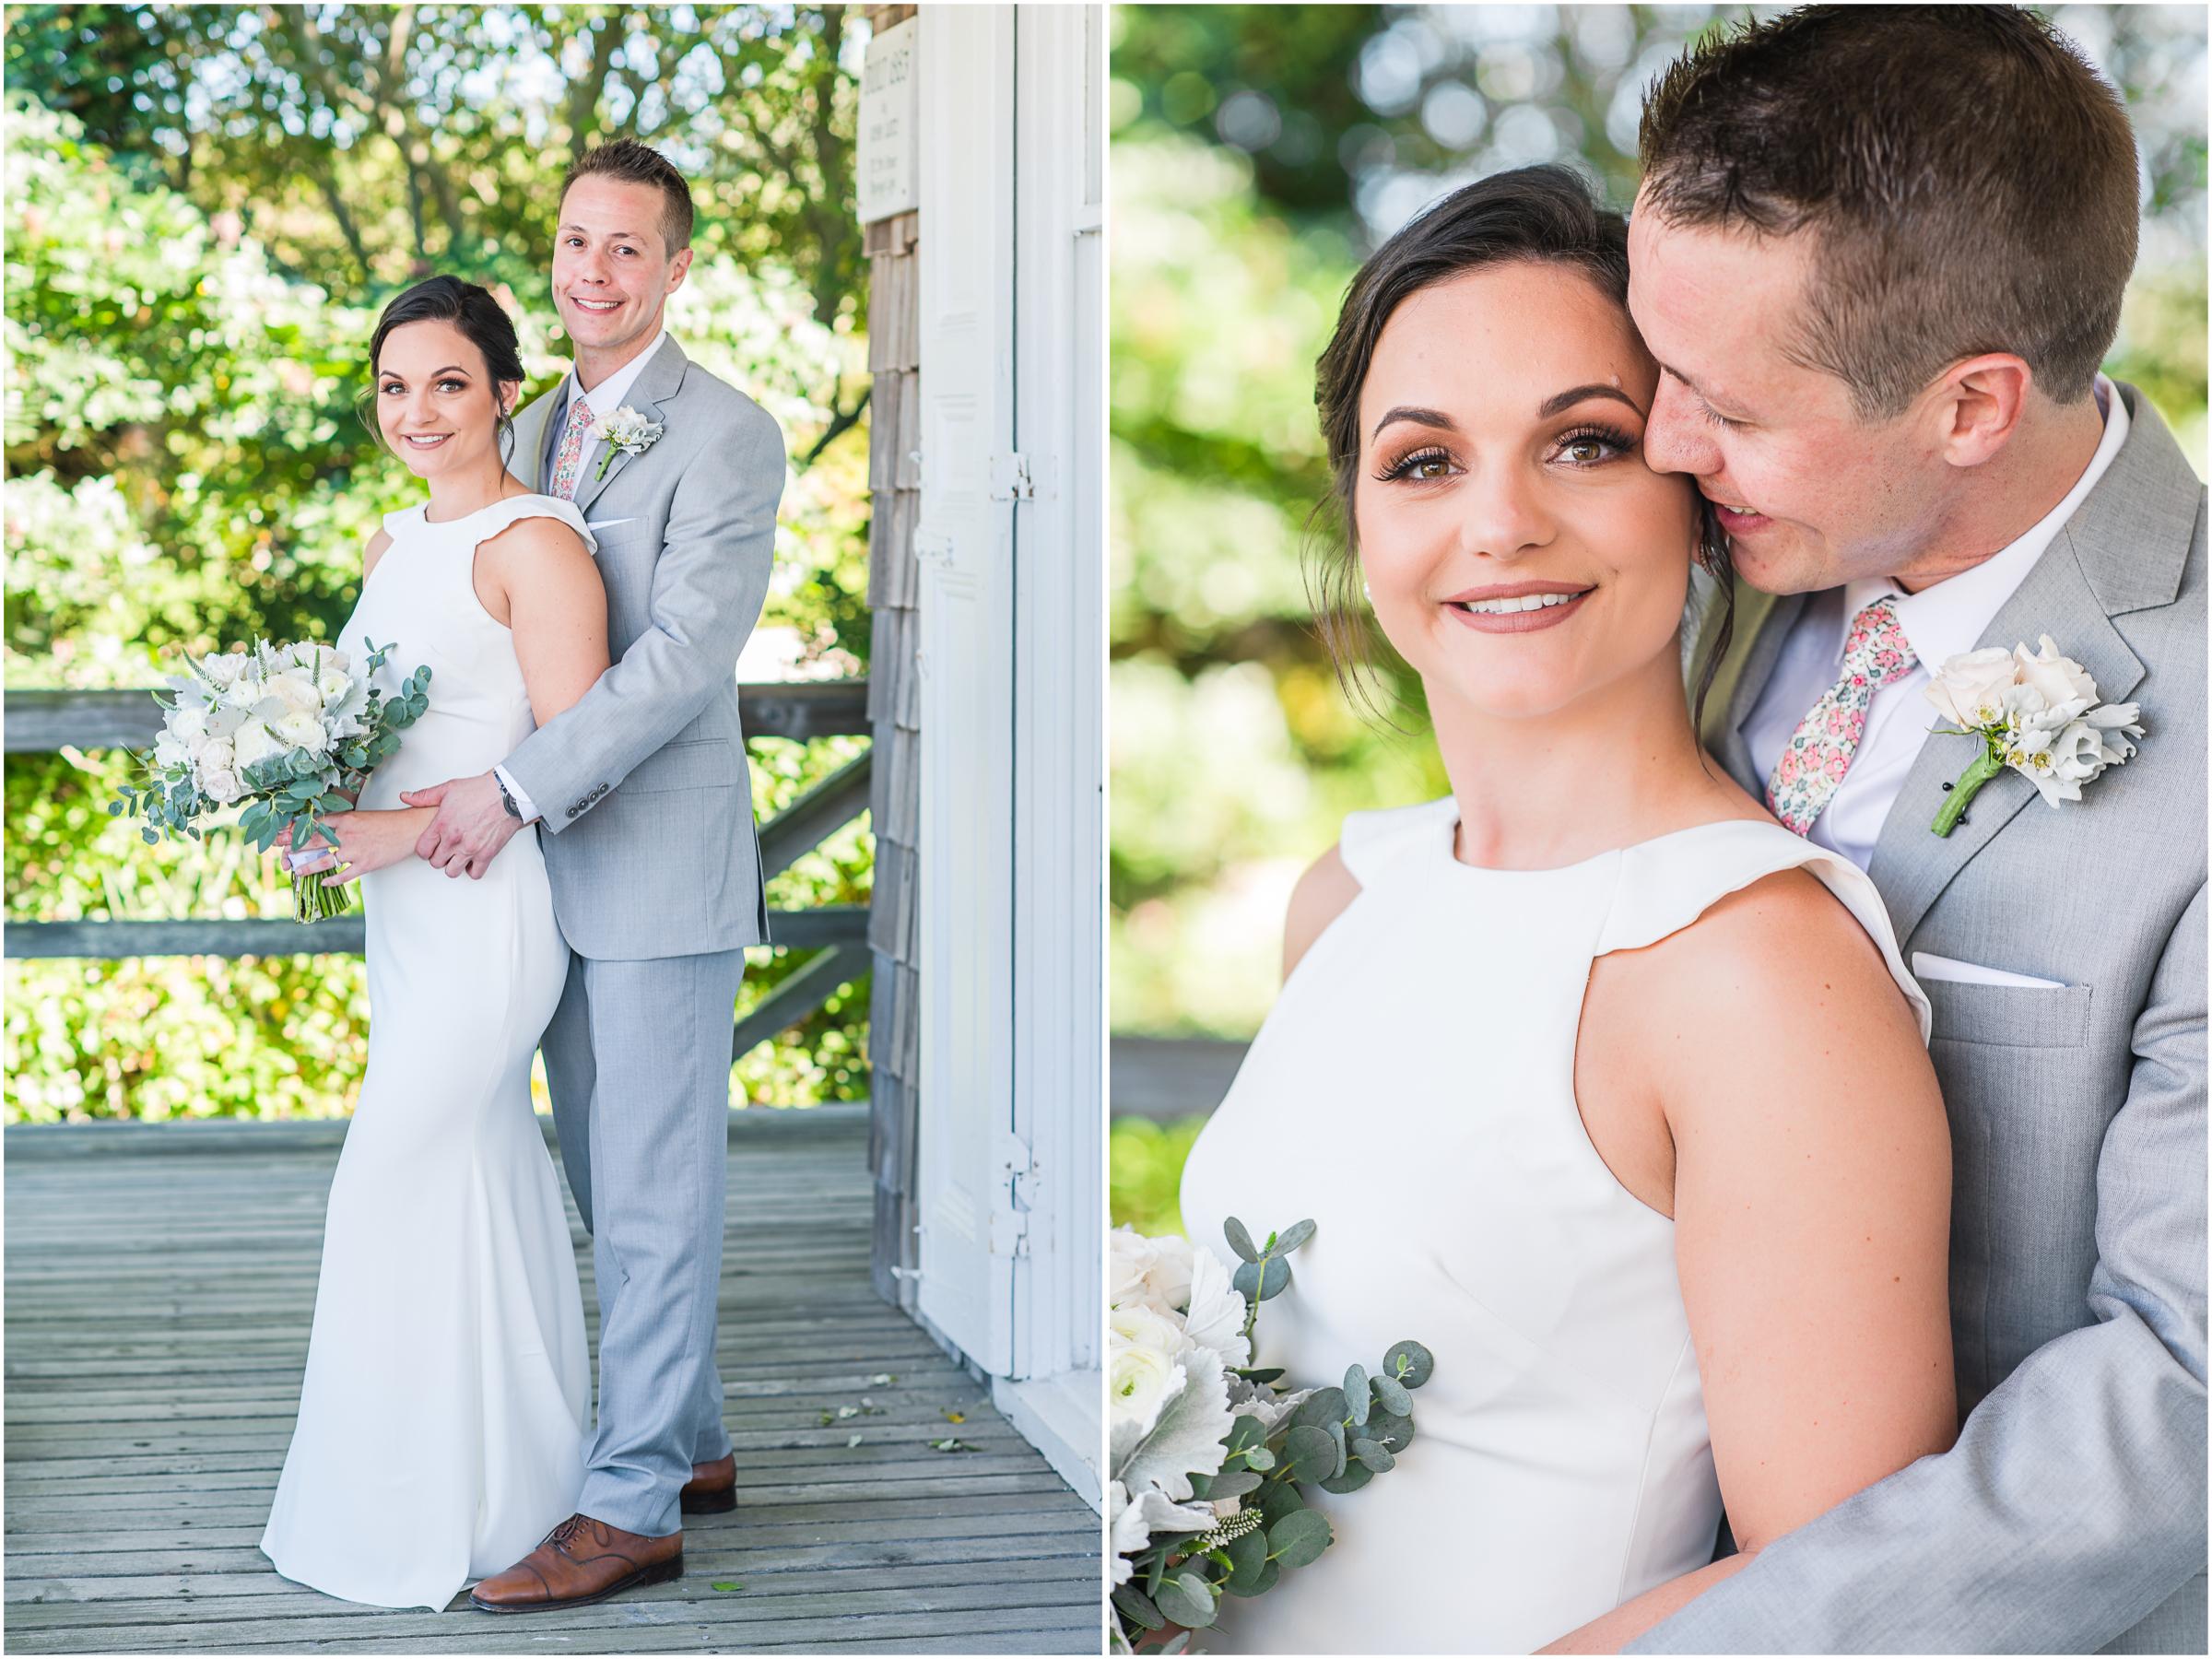 lbi-wedding-arts-foundation-lbi-wedding-photographer-21.jpg